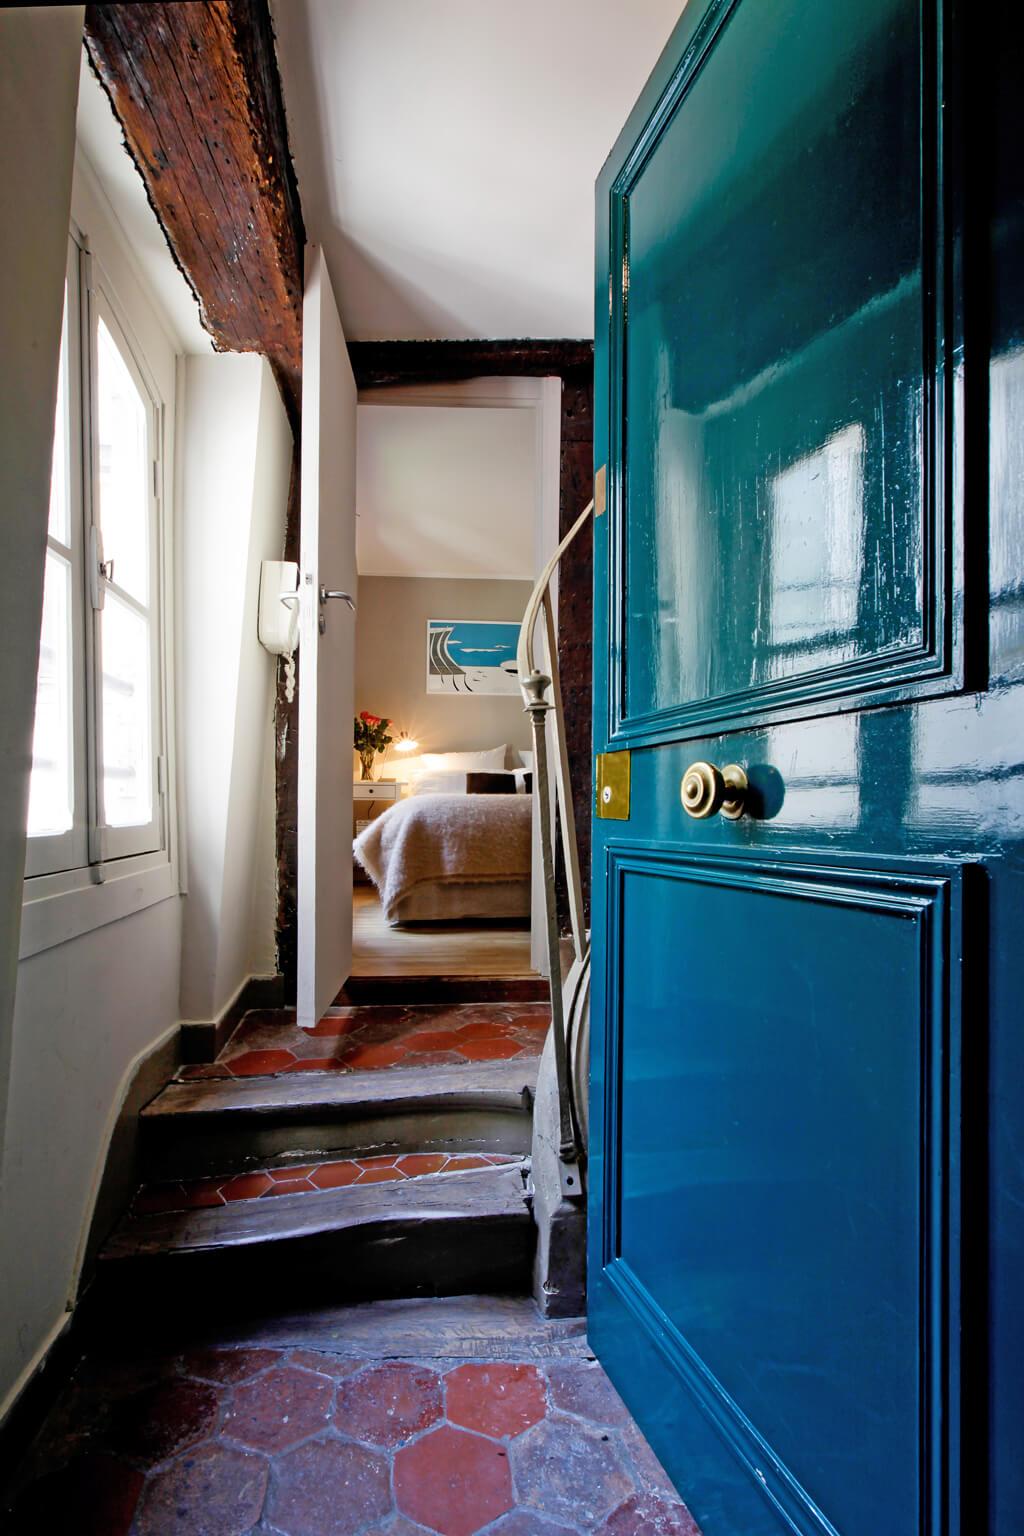 Paris Vacation Apartment Rental | Louvre | Haven in